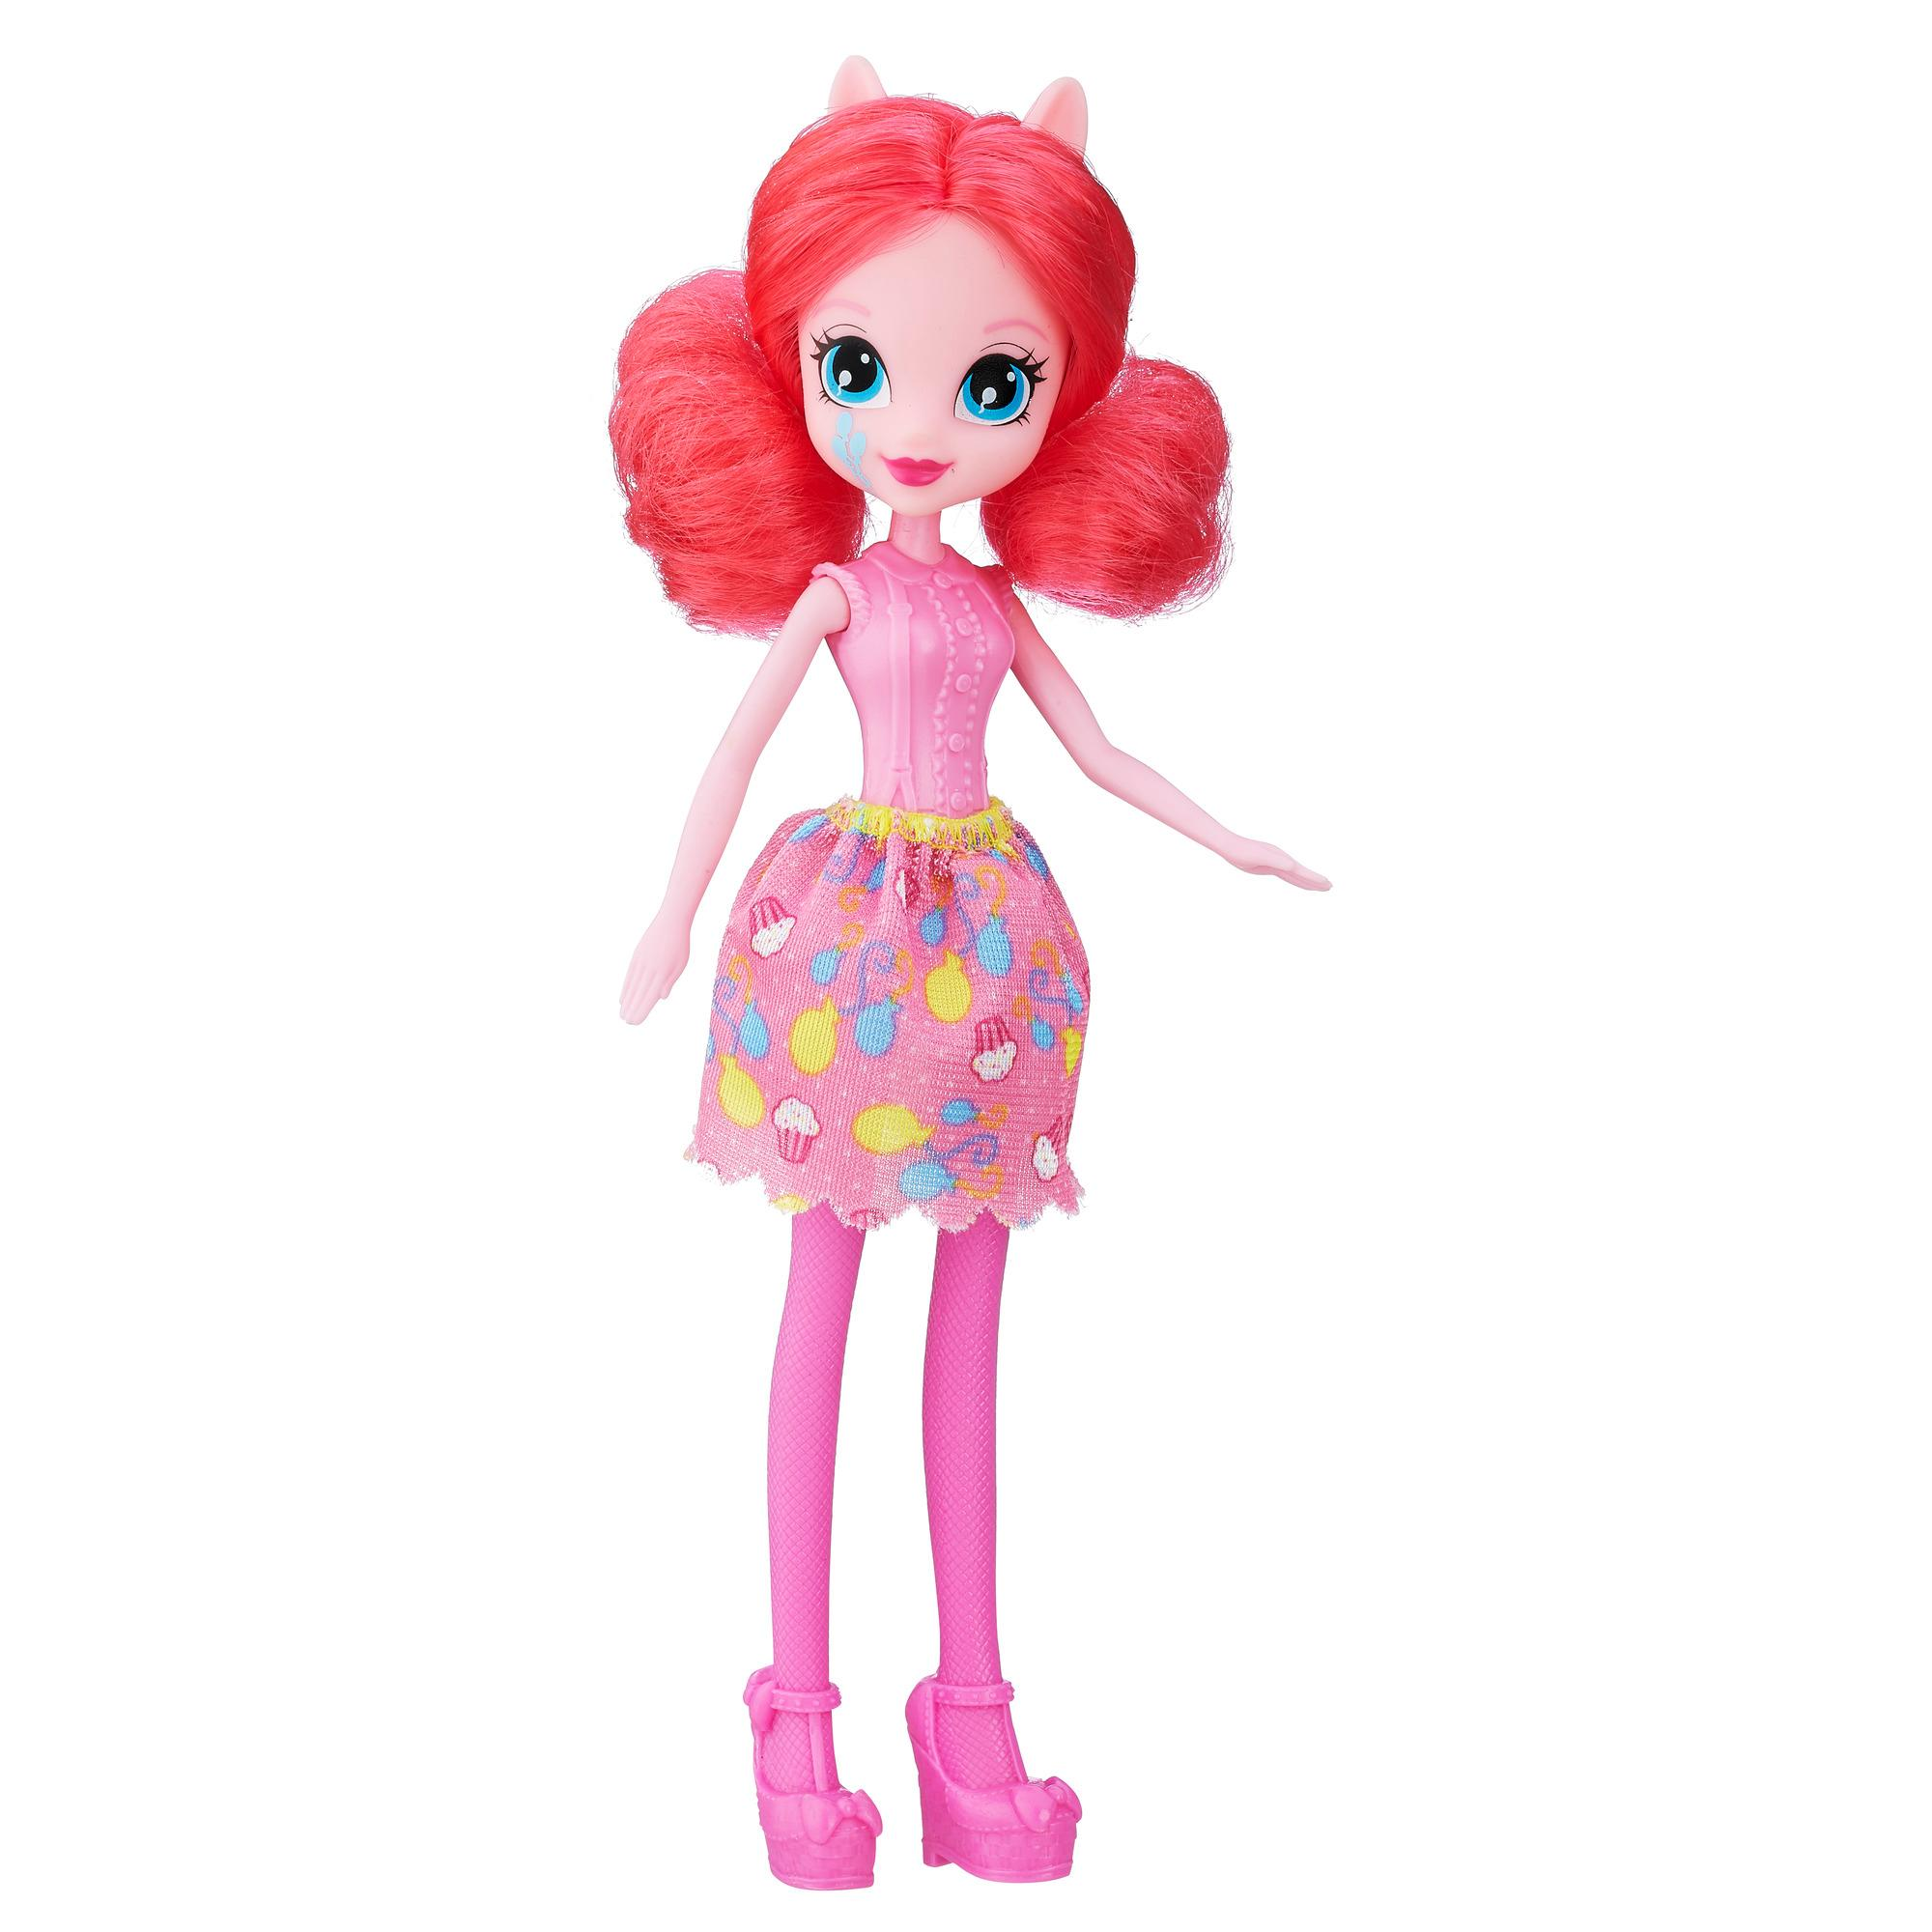 My Little Pony Equestria Girls Pinkie Pie Basic Doll